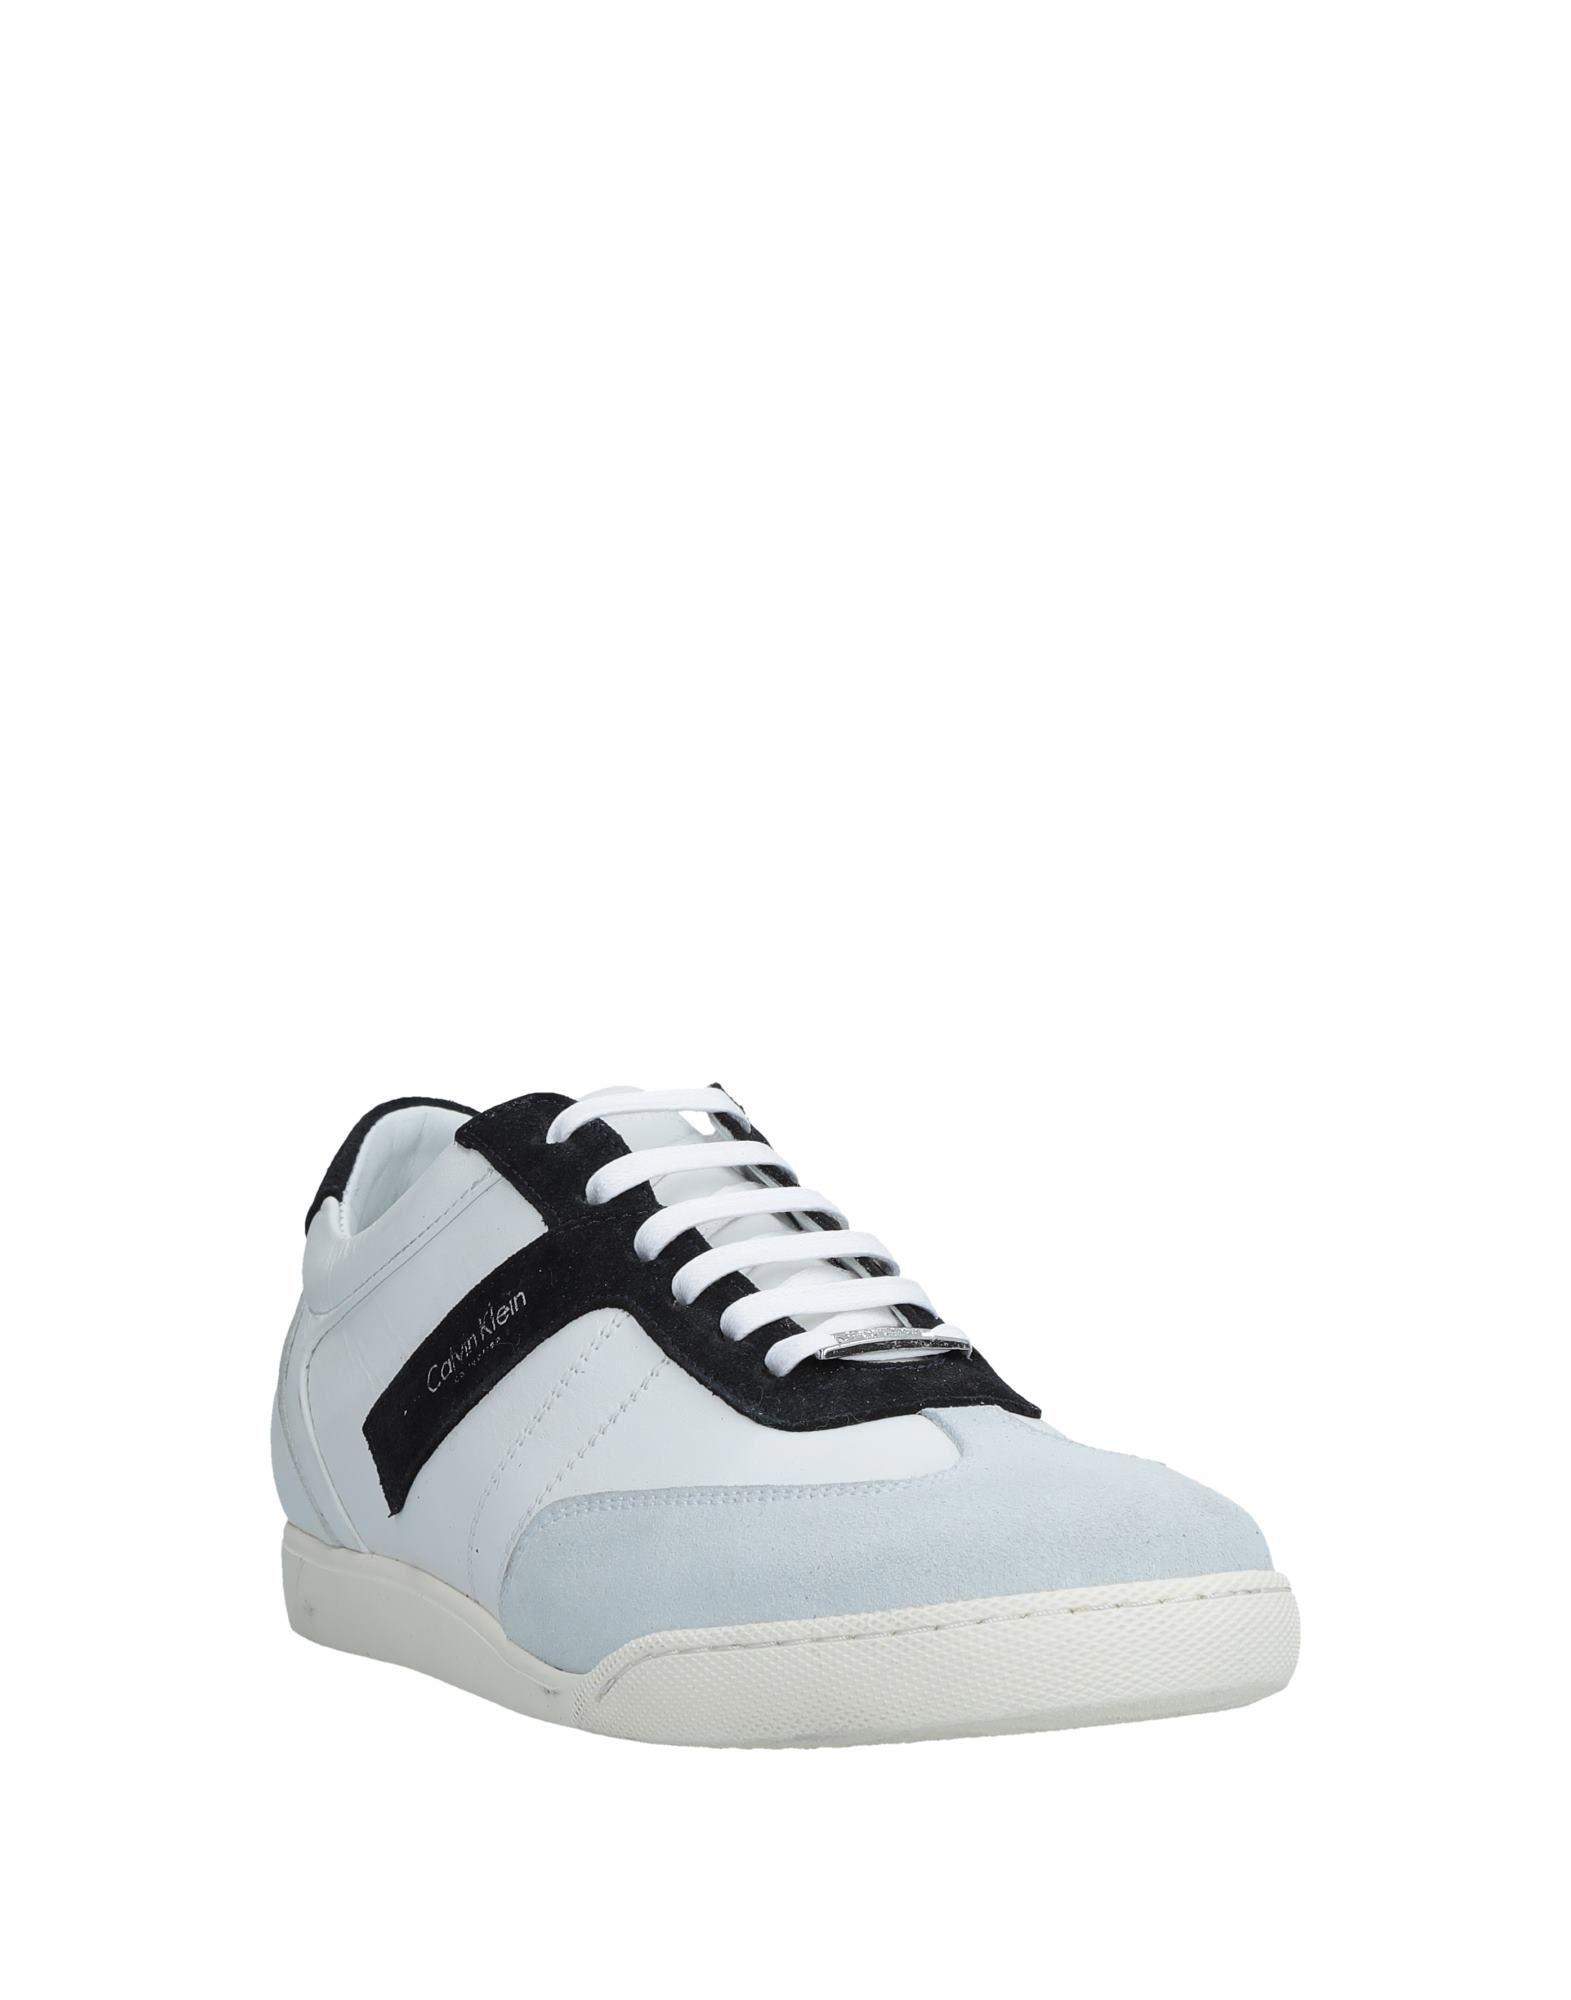 Calvin Klein Sneakers Herren  11542161CL Gute Qualität beliebte Schuhe